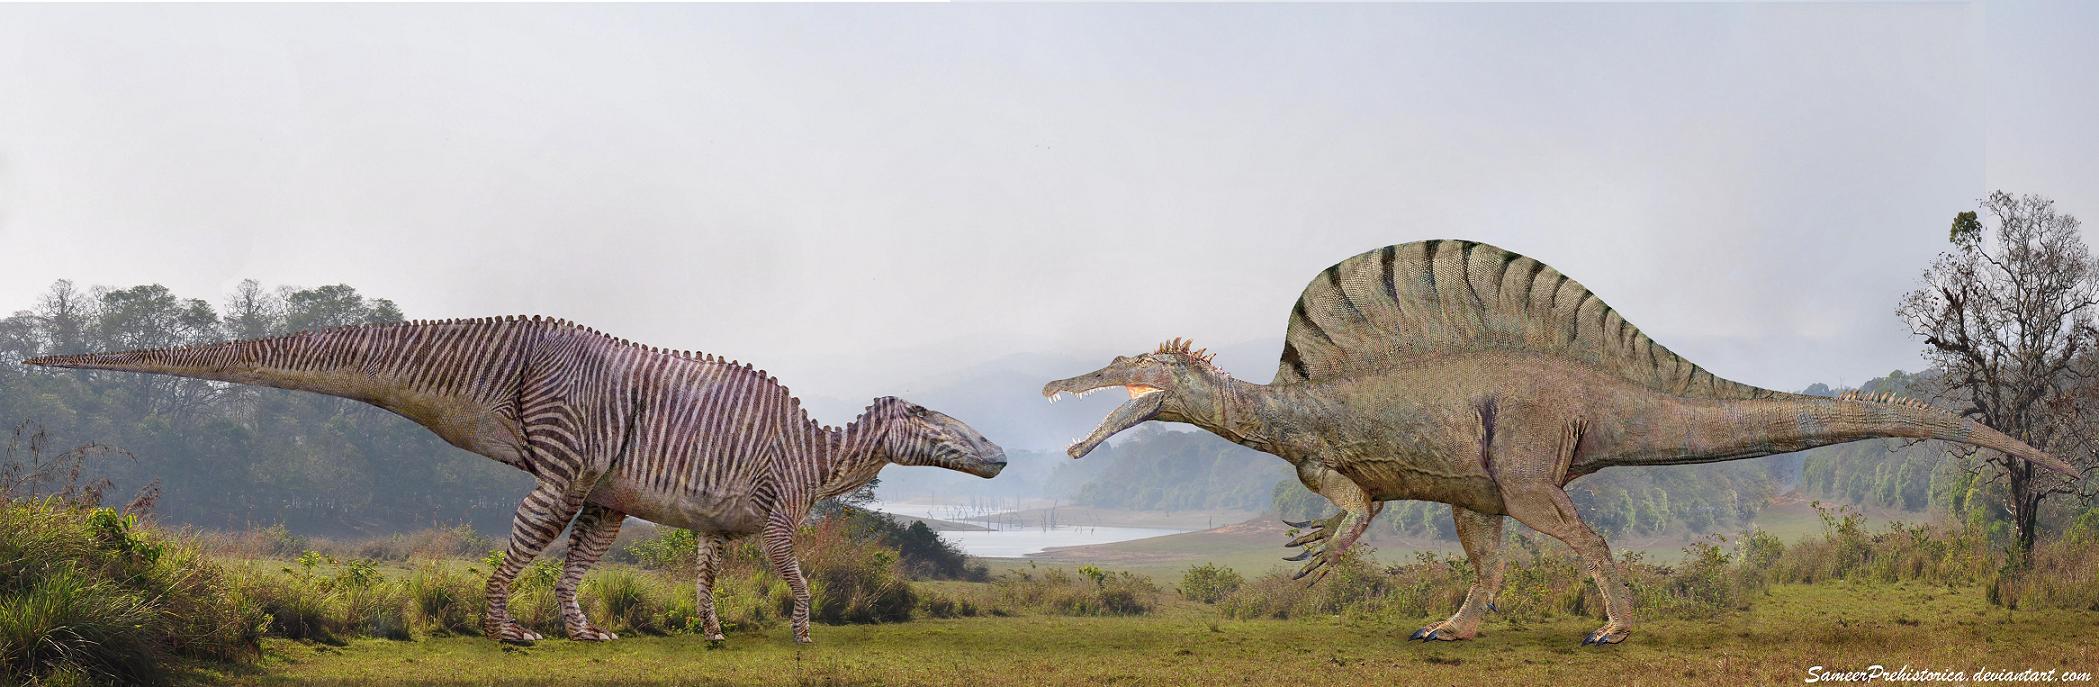 Shantungosaurus vs Spinosaurus by SameerPrehistorica on ...